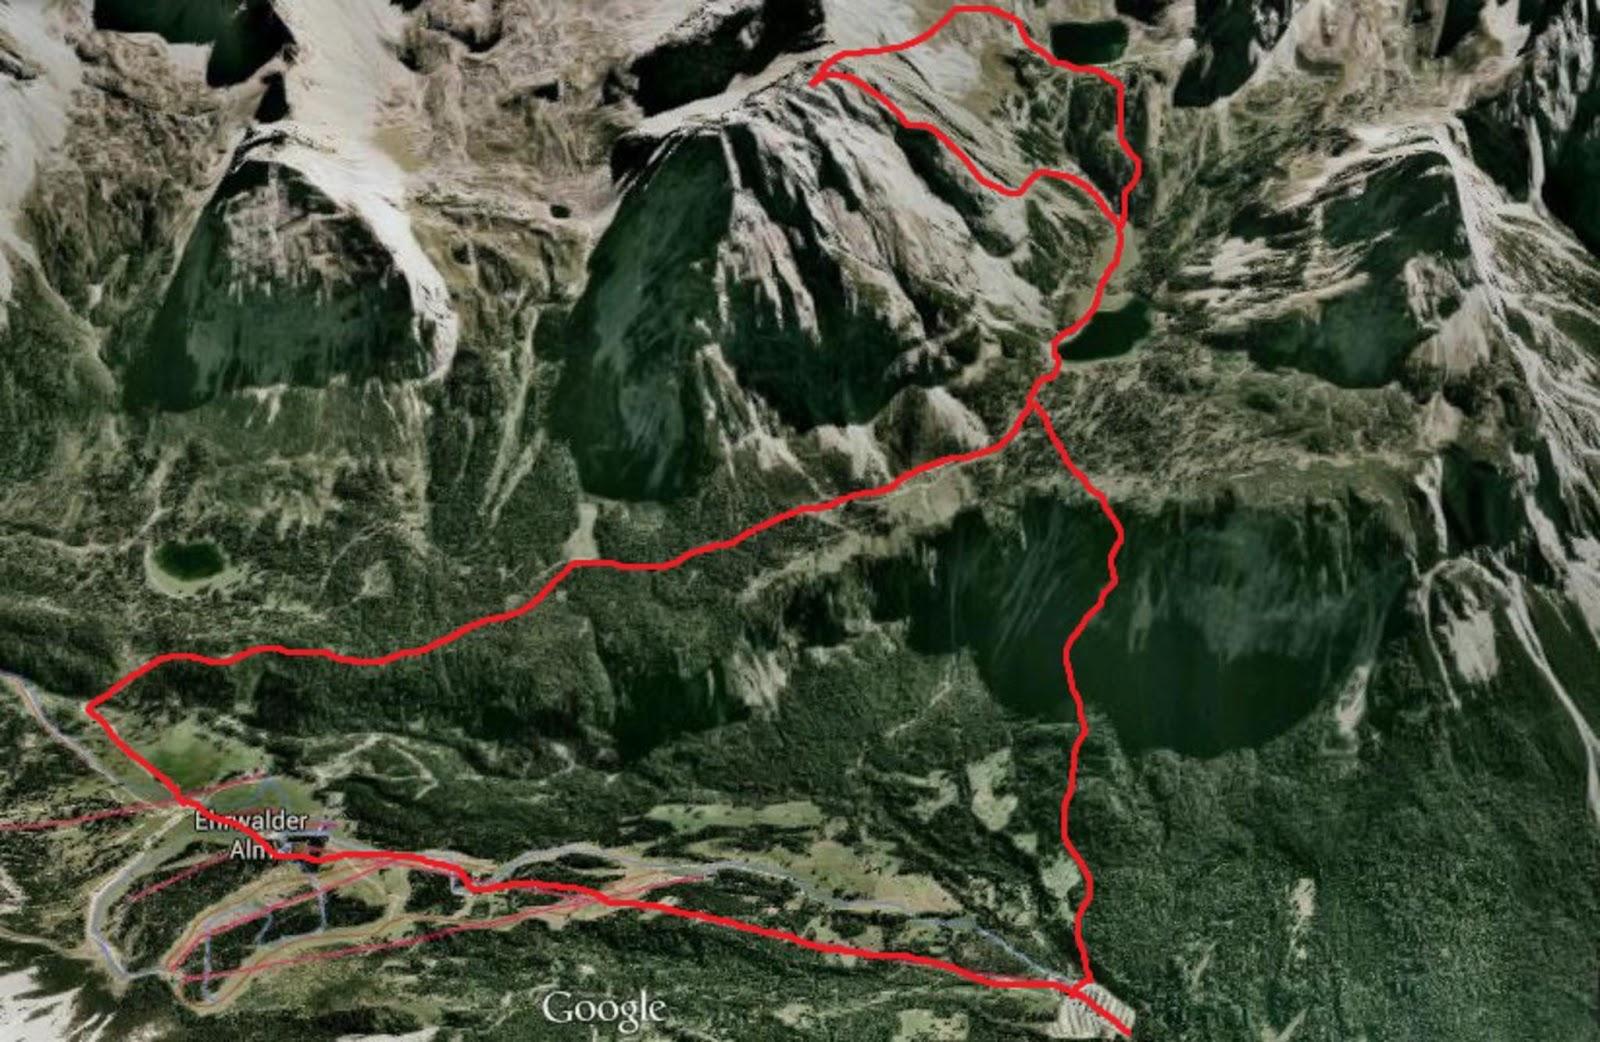 Klettersteig Karte : Rauf gehts tajakante klettersteig d e